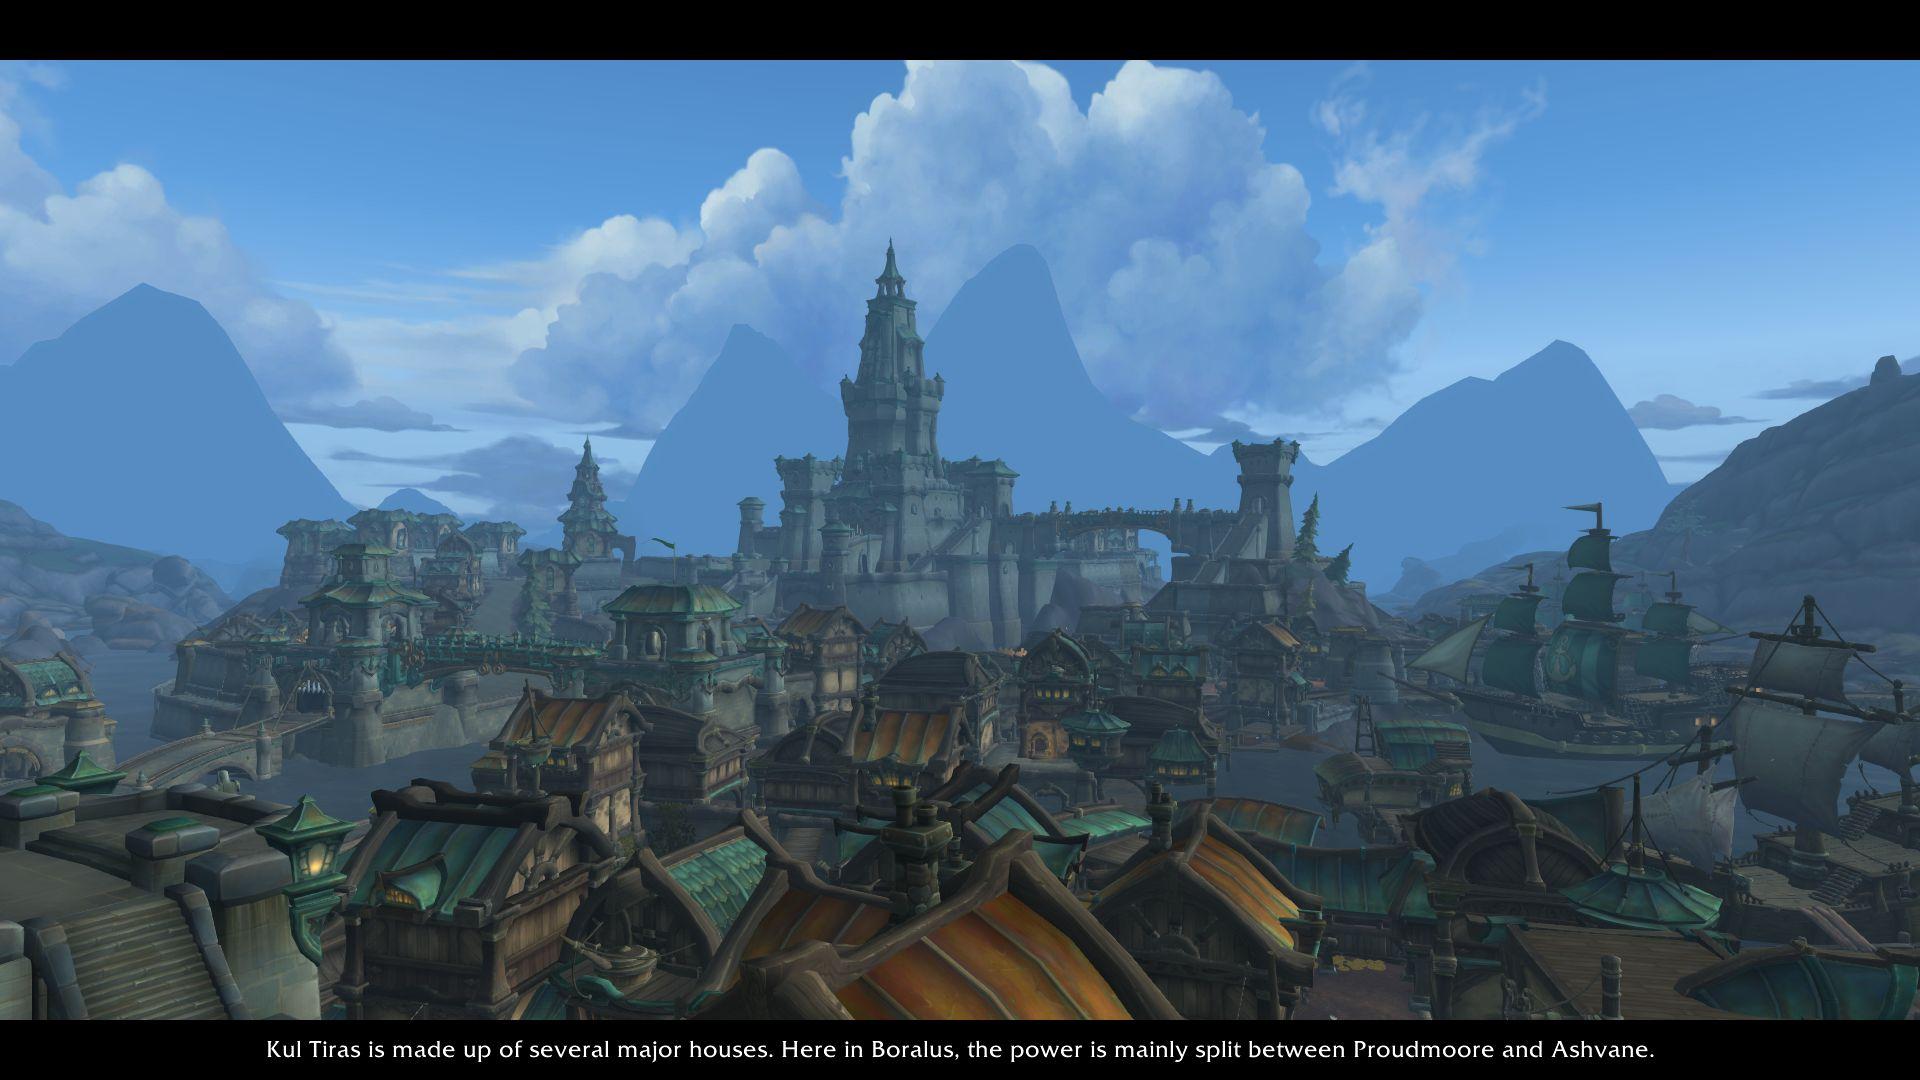 world-of-warcraft-screenshot-2018-03-21-18-43-48-09